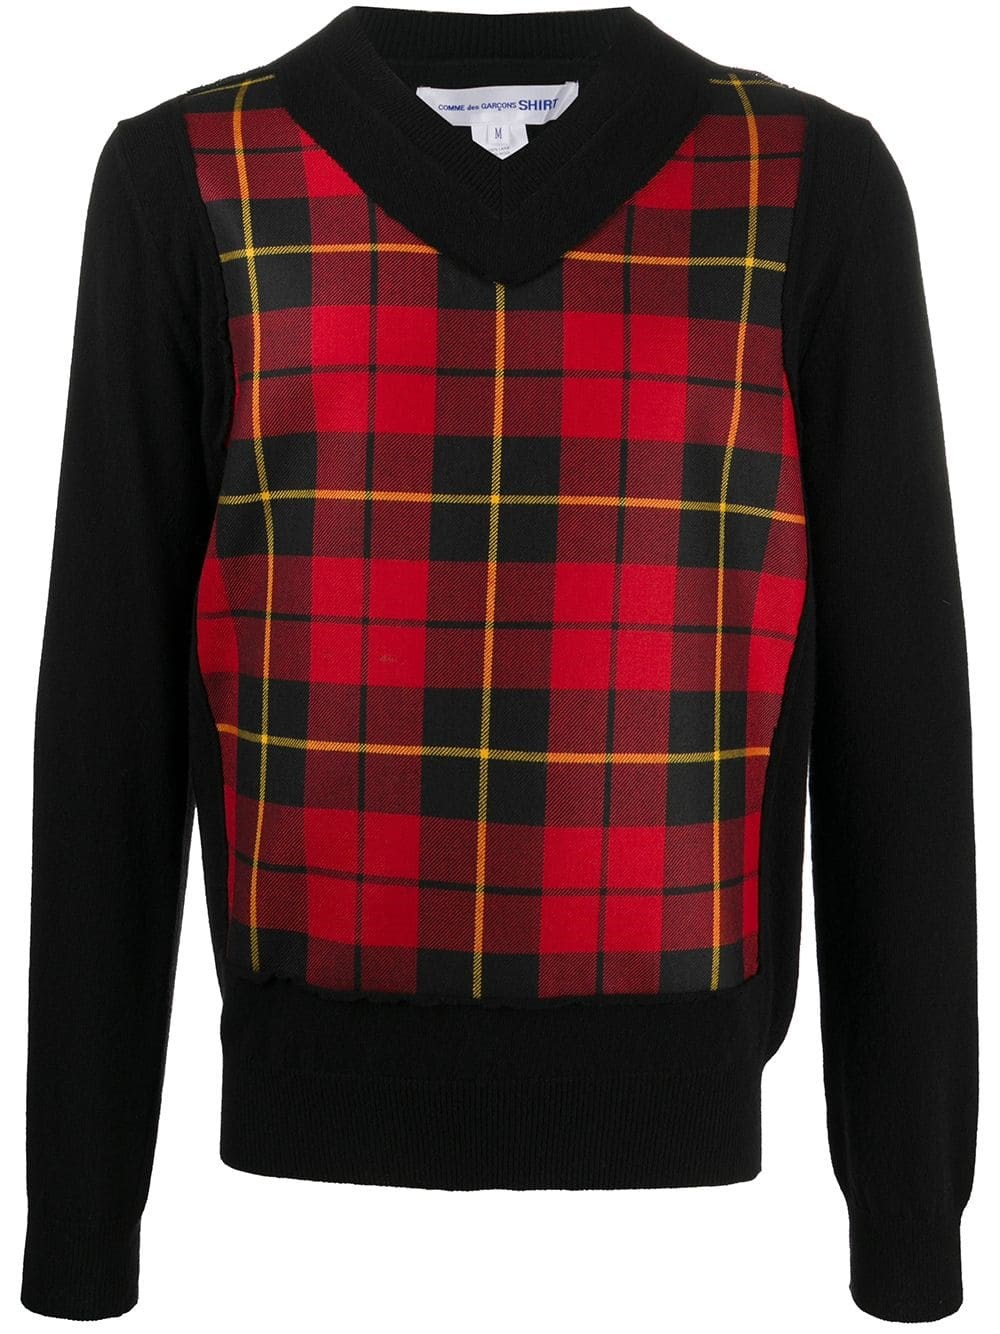 COMME DES GARCONS SHIRT Tartan Panel Sweater